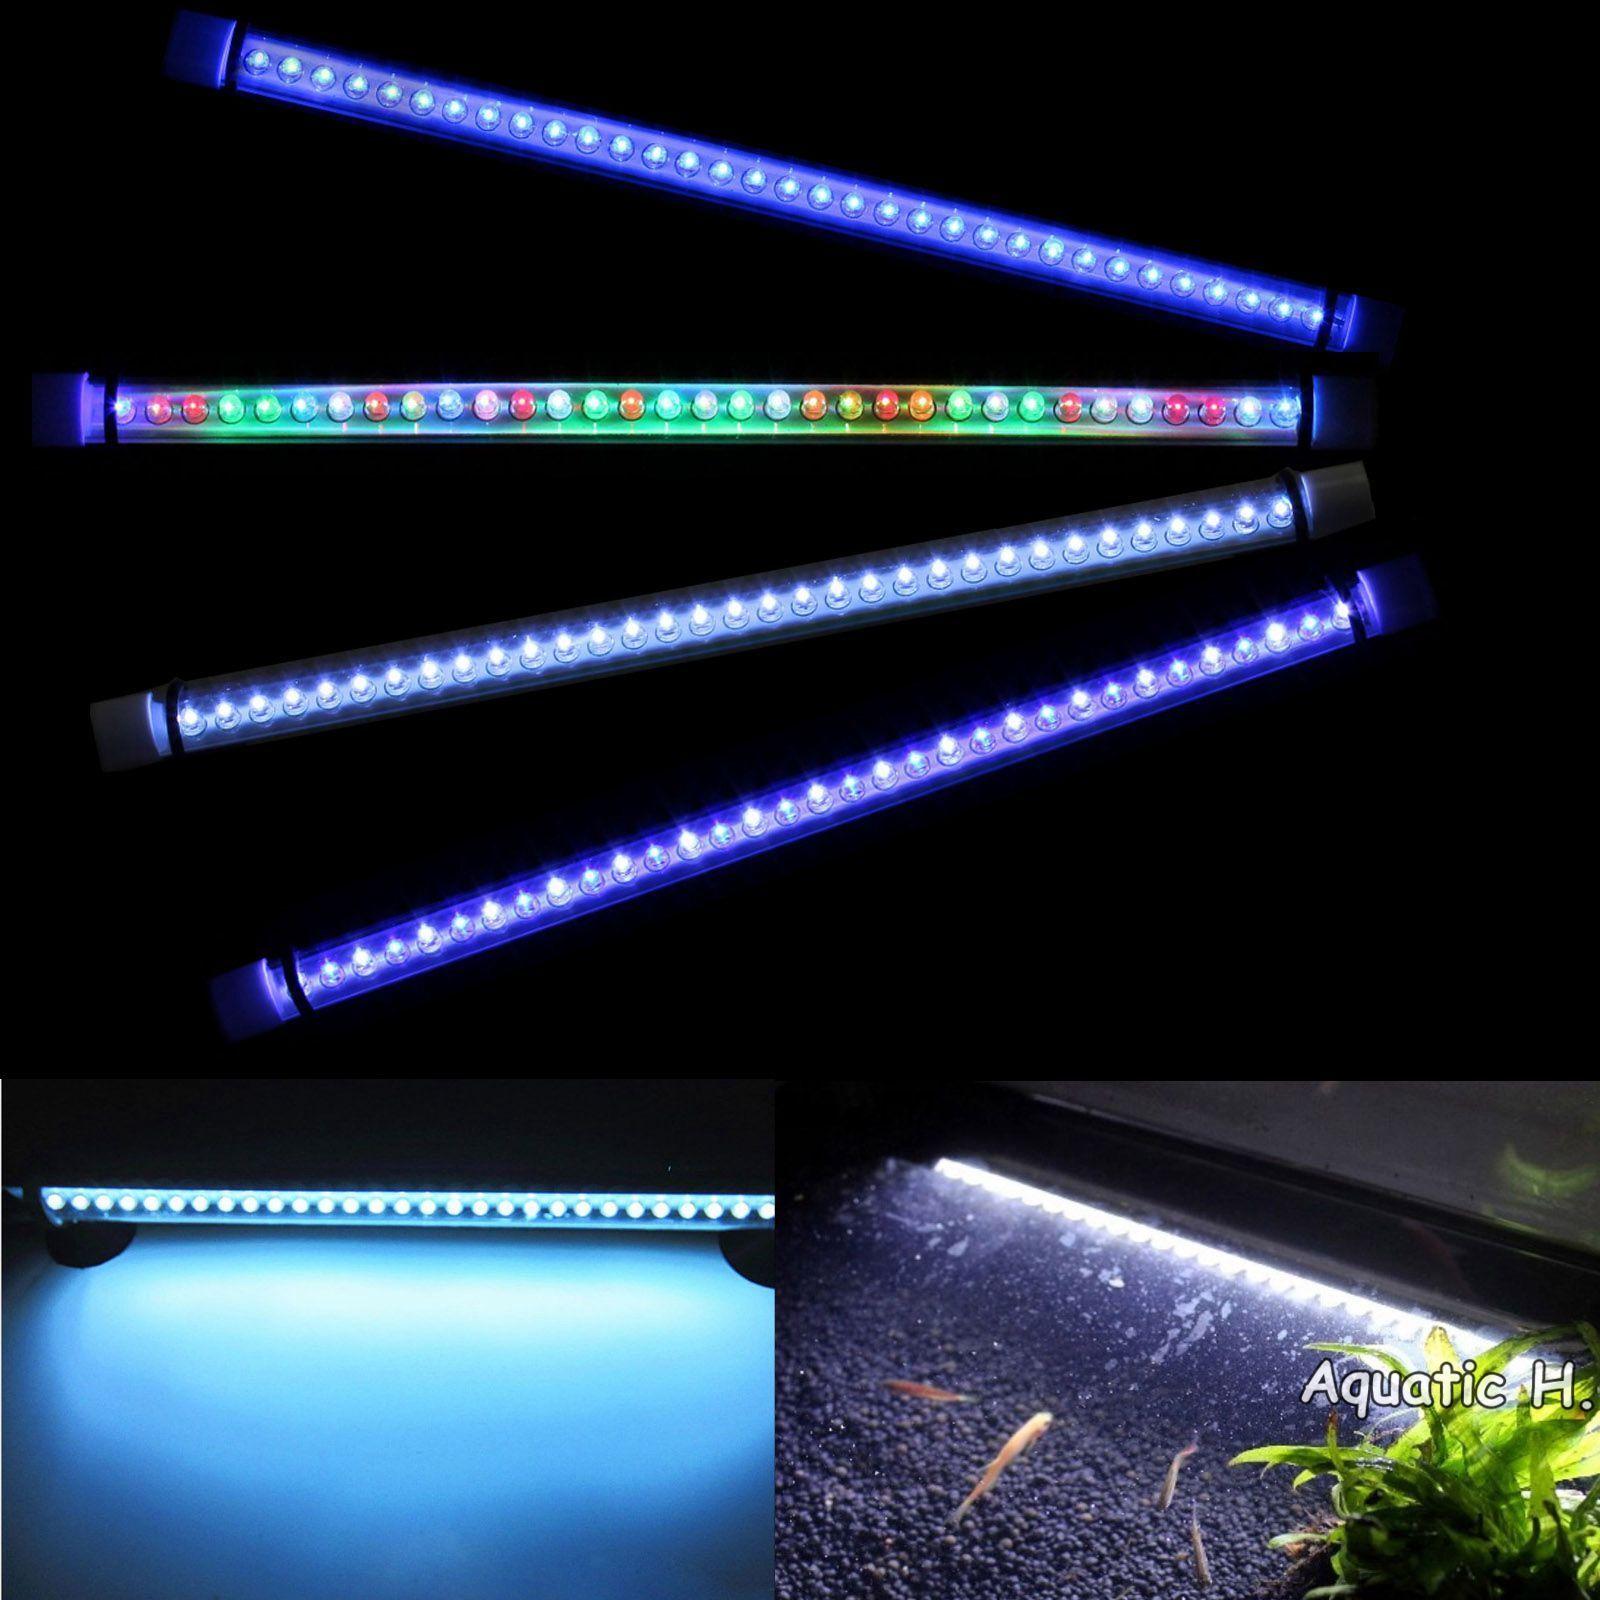 Aquaneat Aquarium Led Light Fish Tank Lamp Submersible Water proof Strip Light